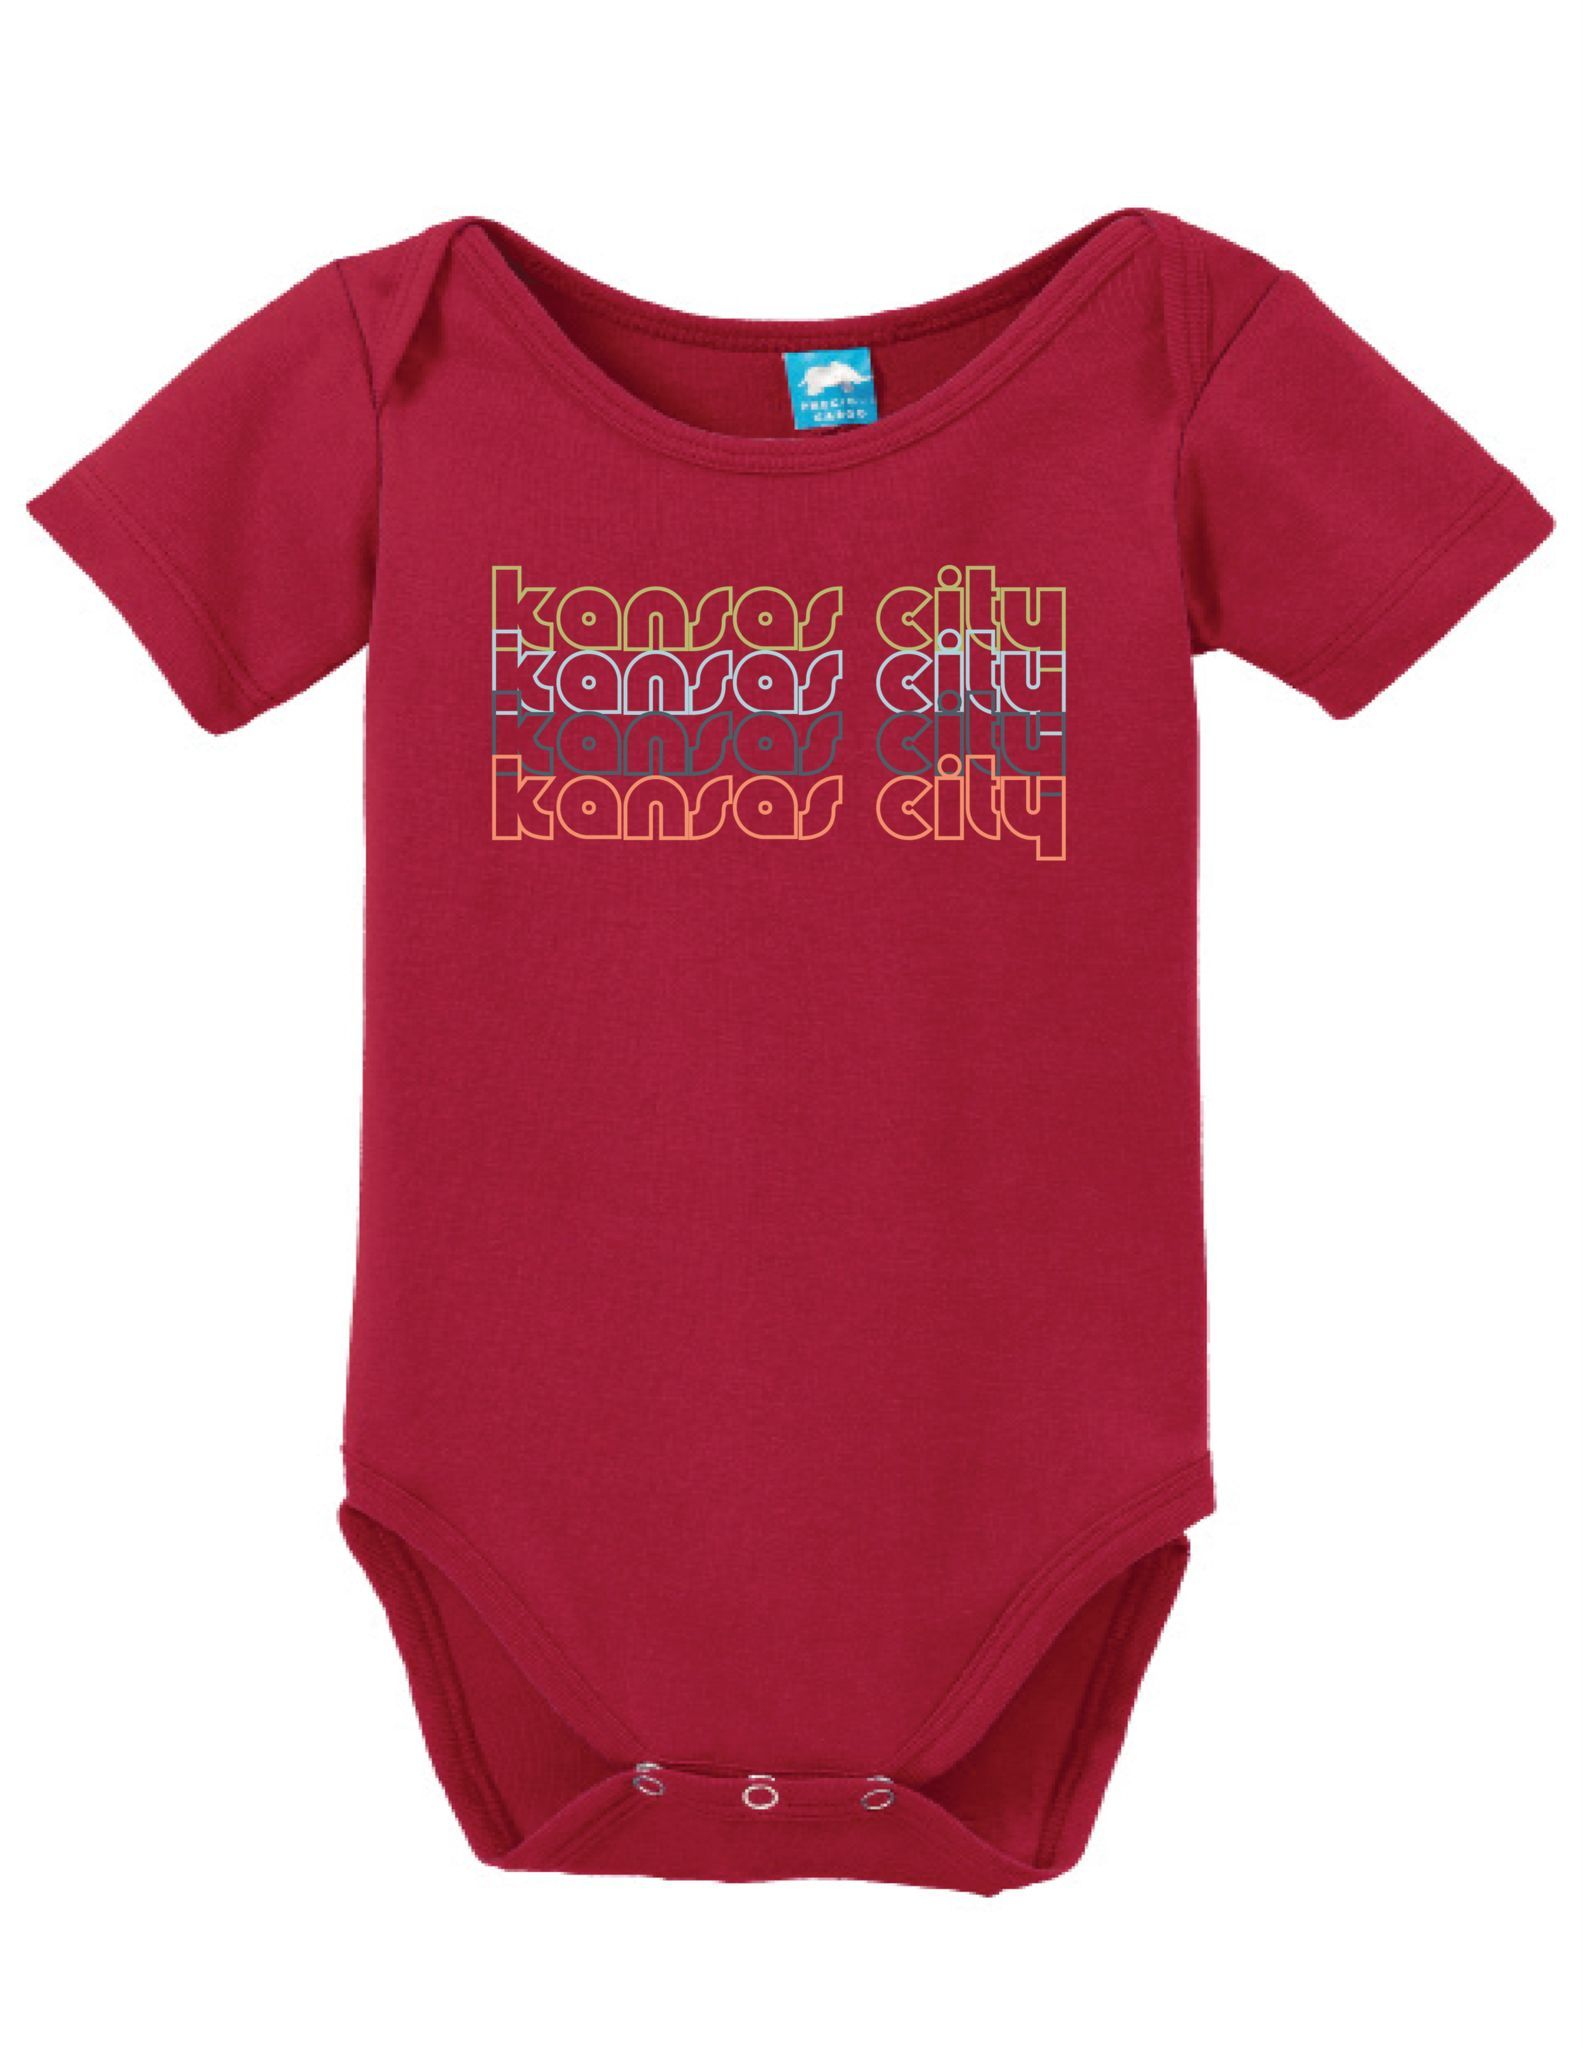 Kansas City Kansas Retro Onesie Funny Bodysuit Baby Romper